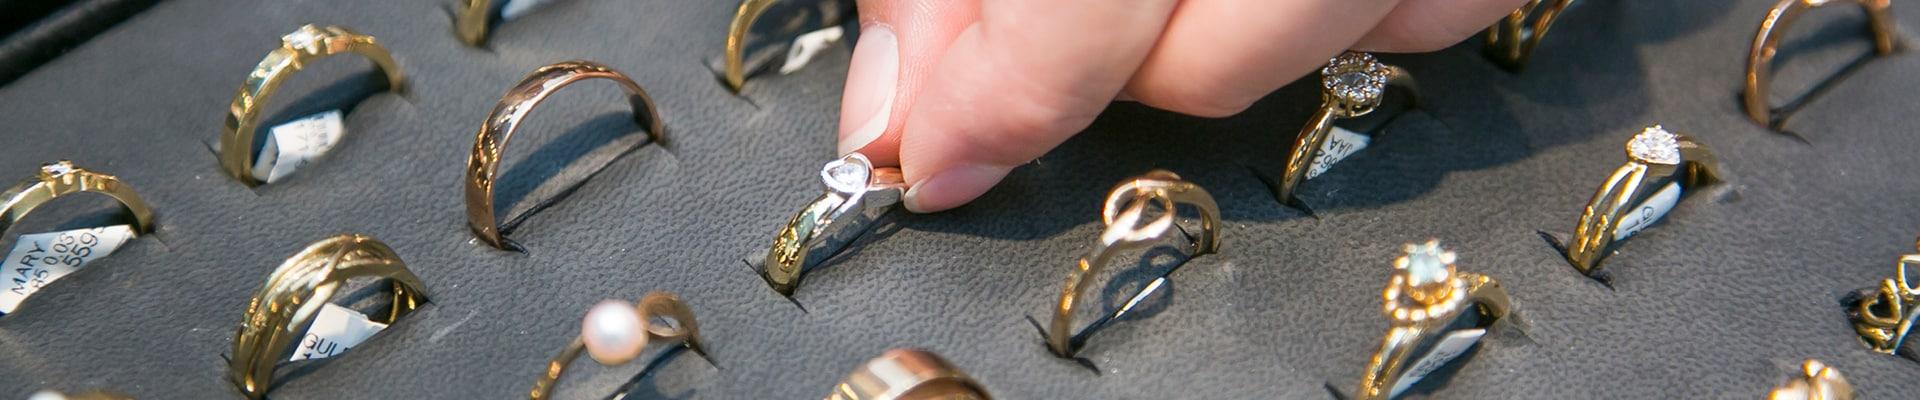 møller guld sølv og ure top